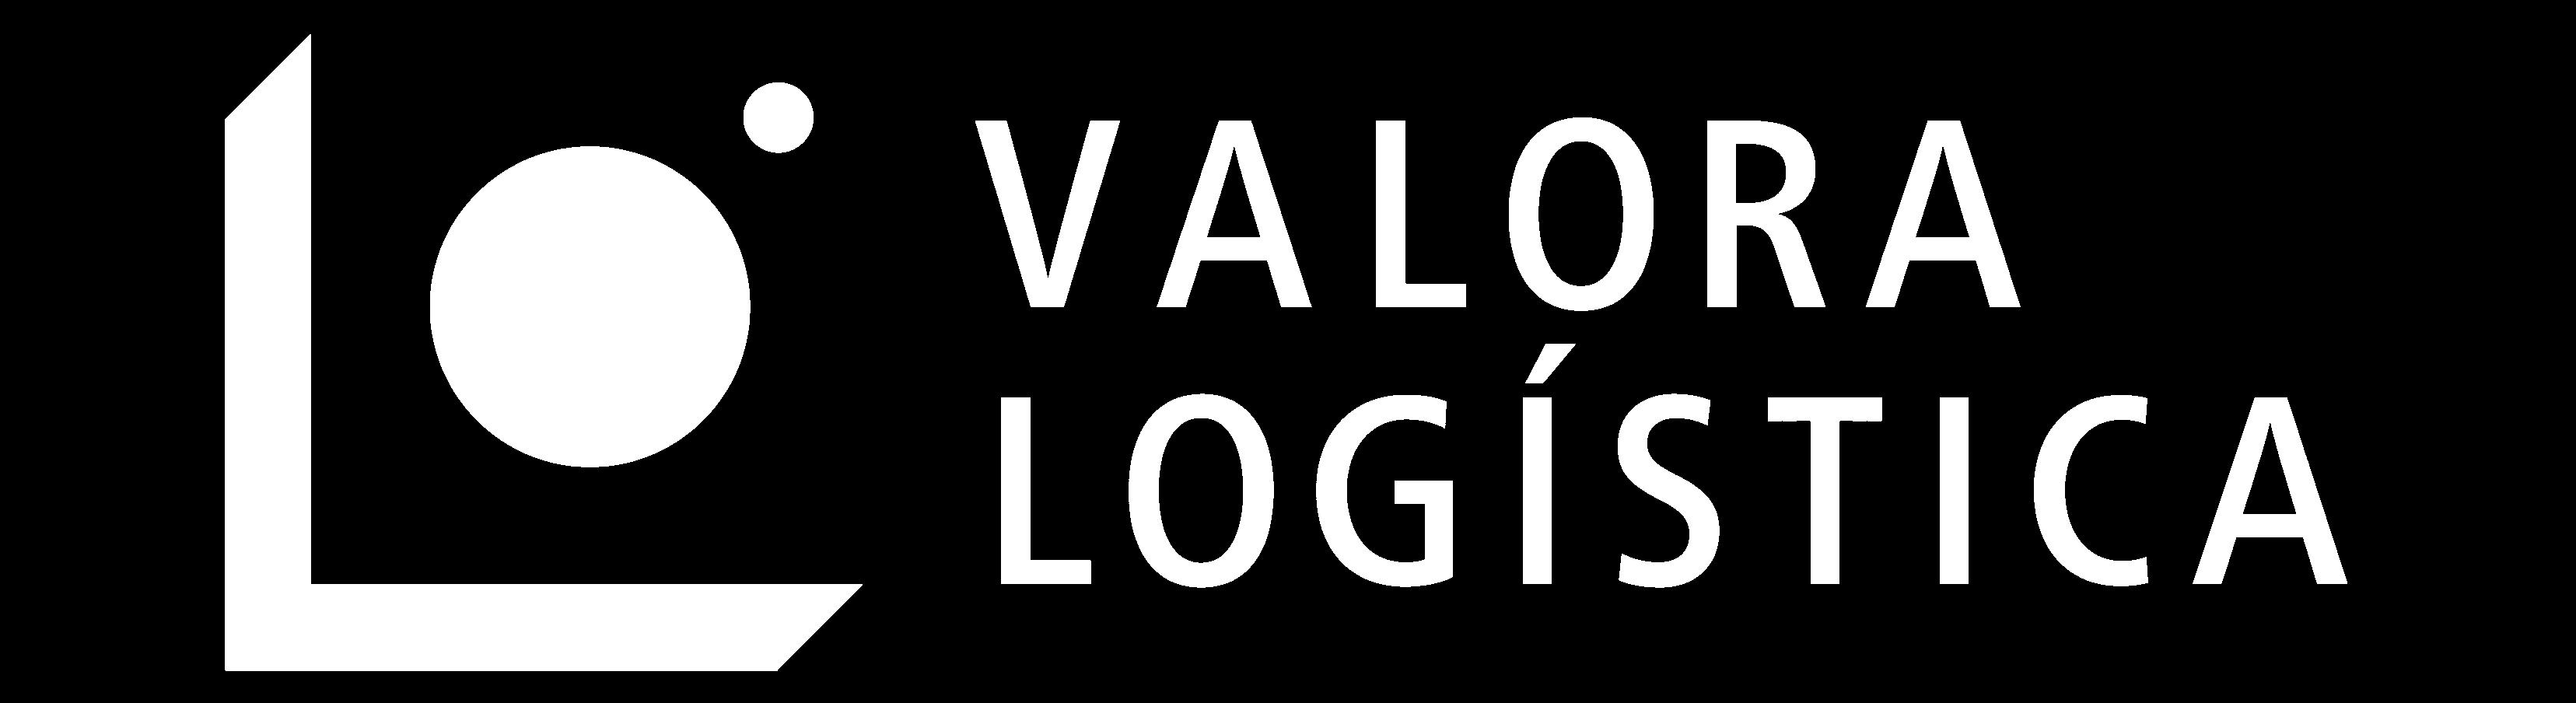 logo valora logística blanco